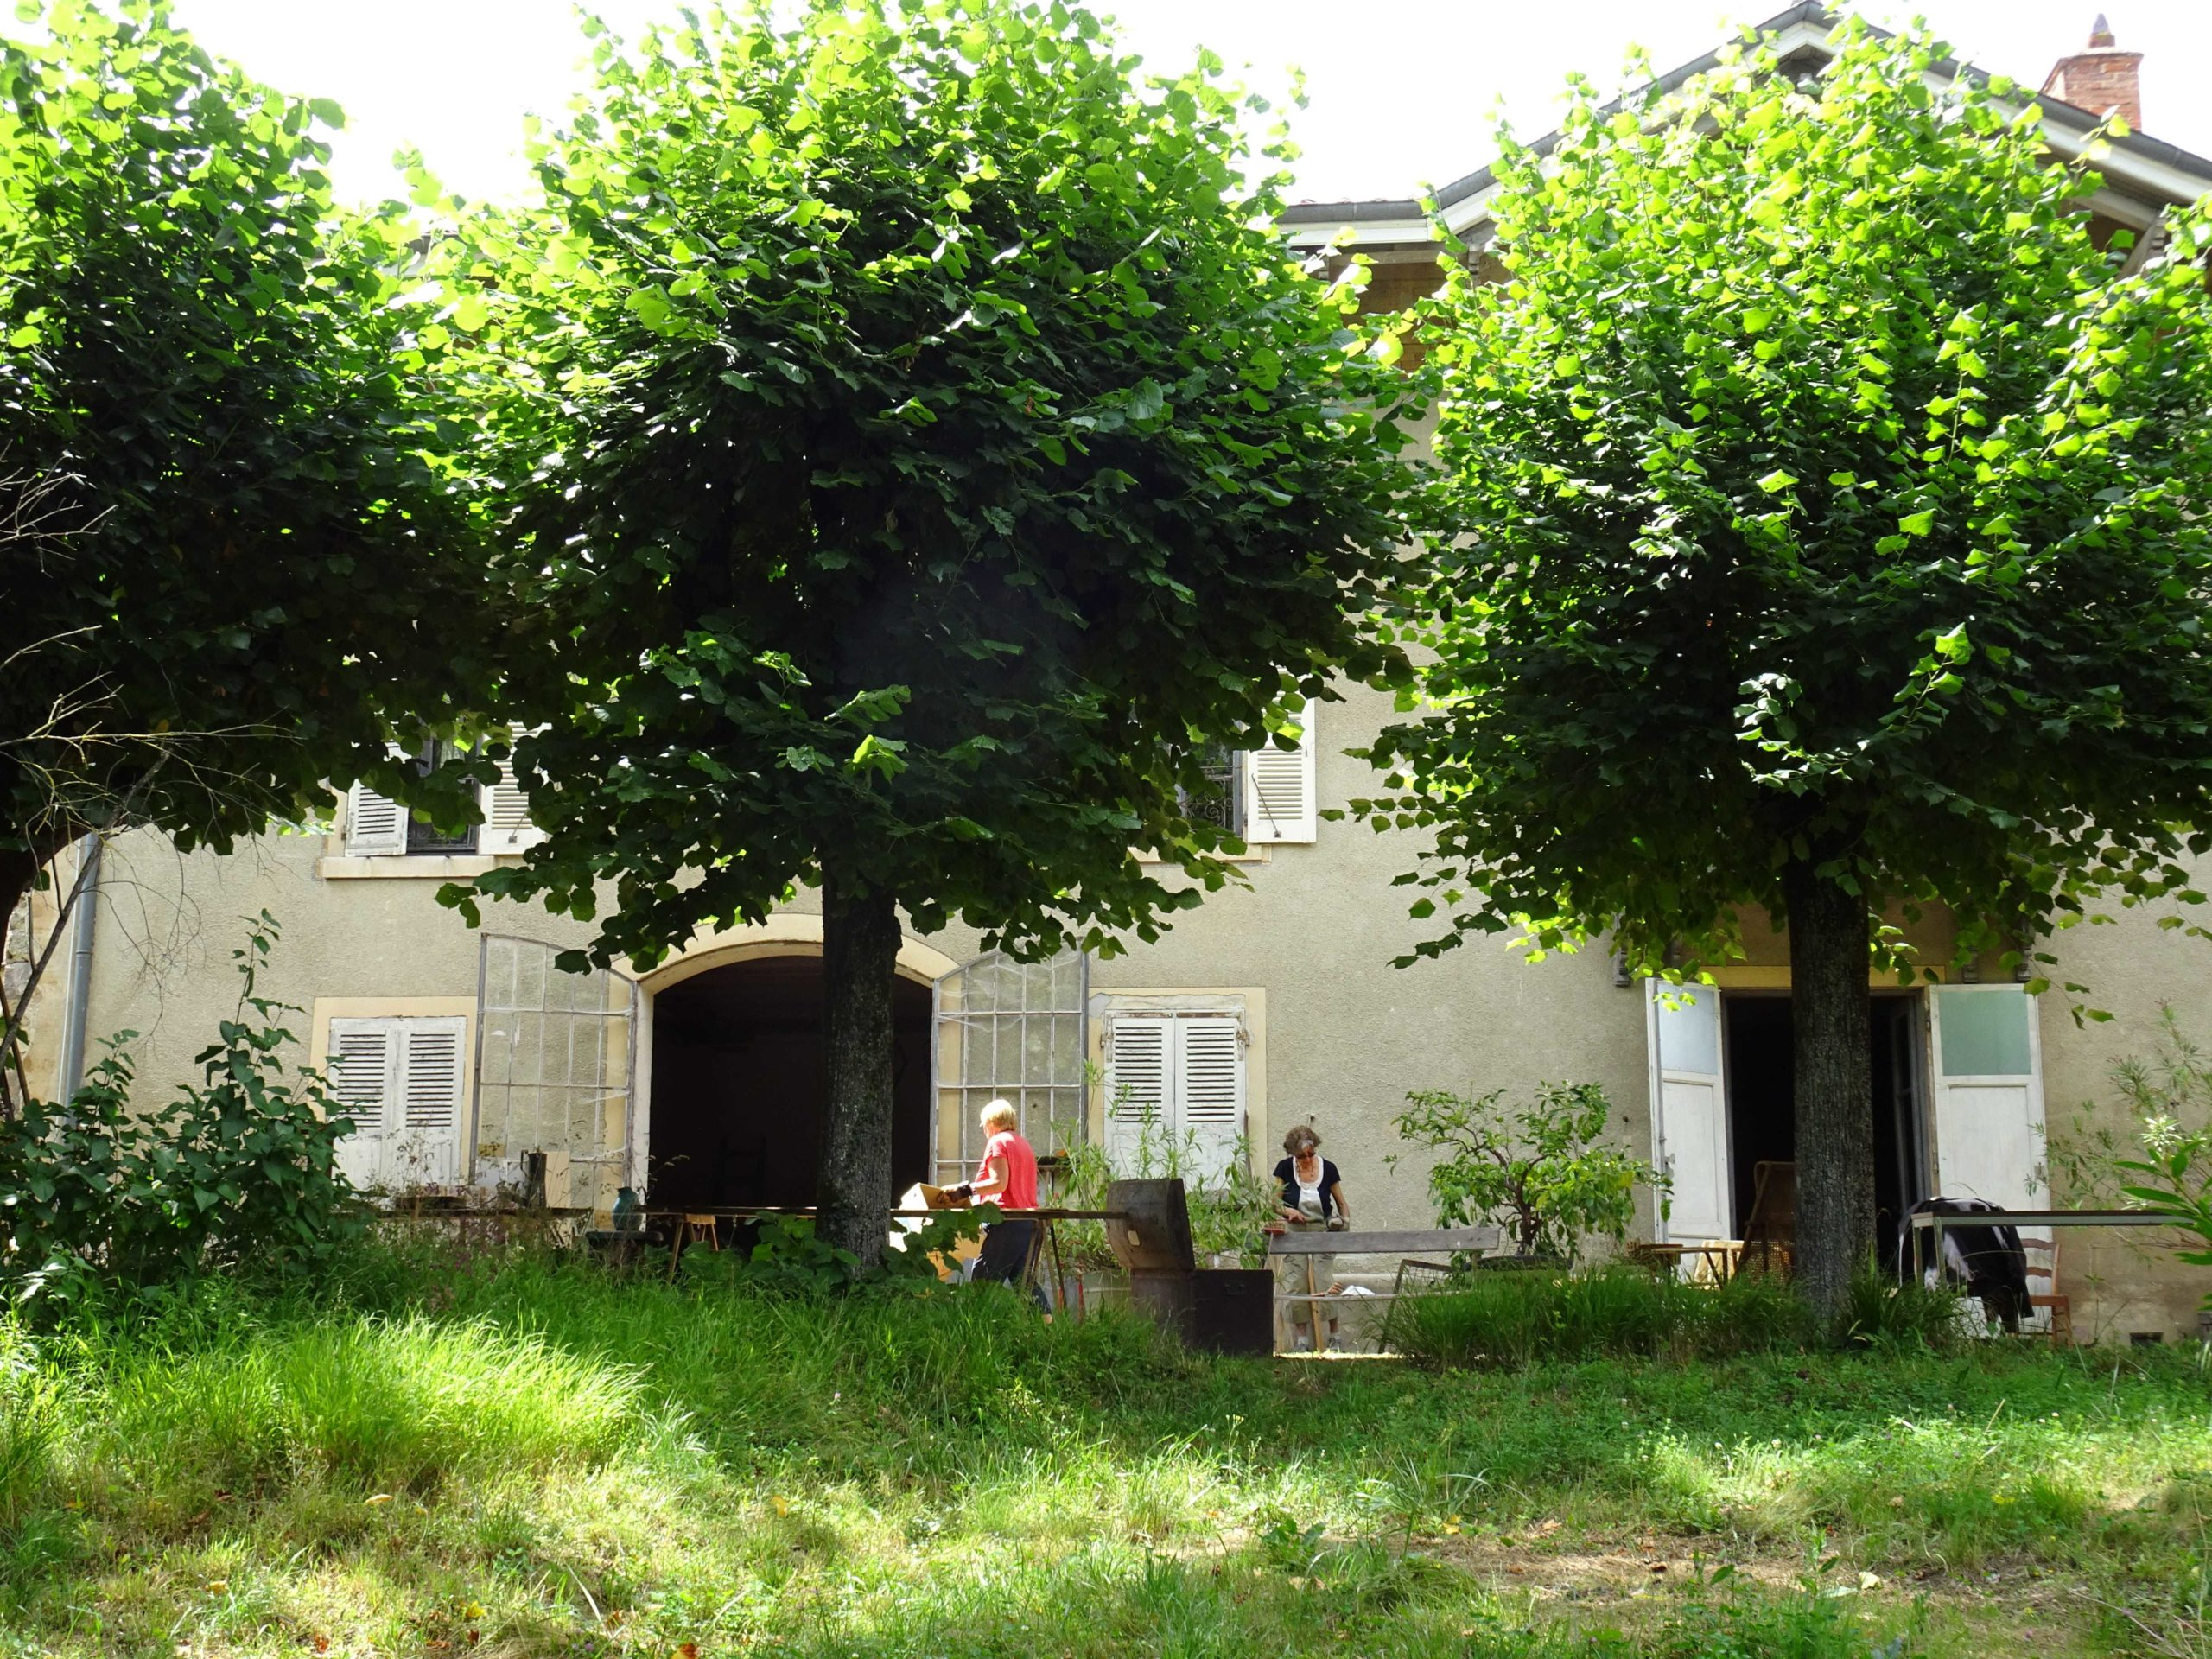 Perreon - Cologi - Habitat participatif - authenticité - arbres centenaires